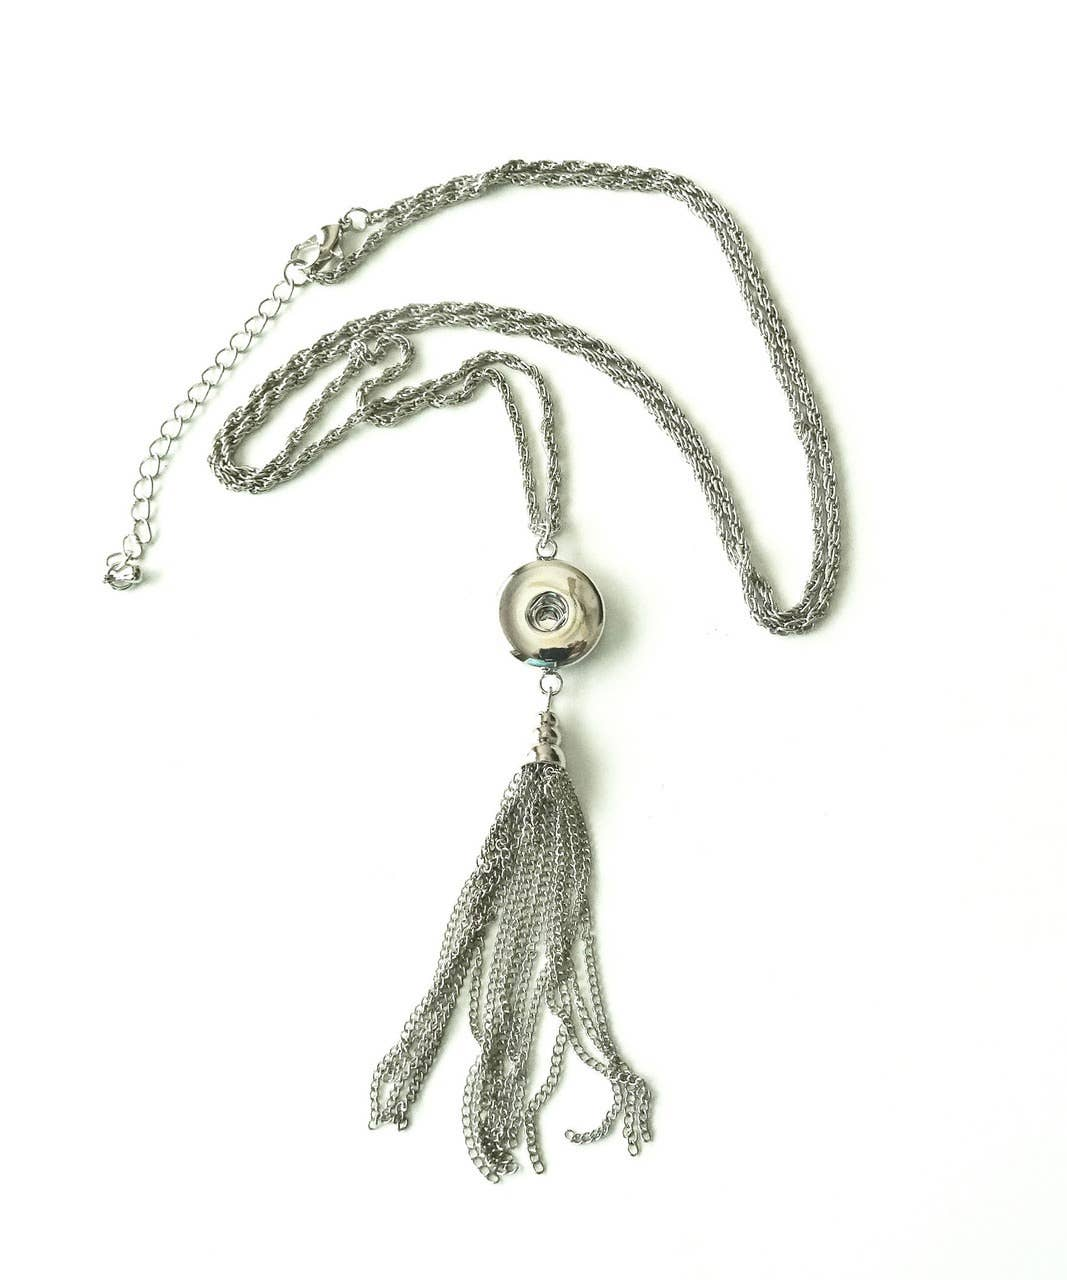 Snap Jewel Tassel Necklace - Silver | Trada Marketplace